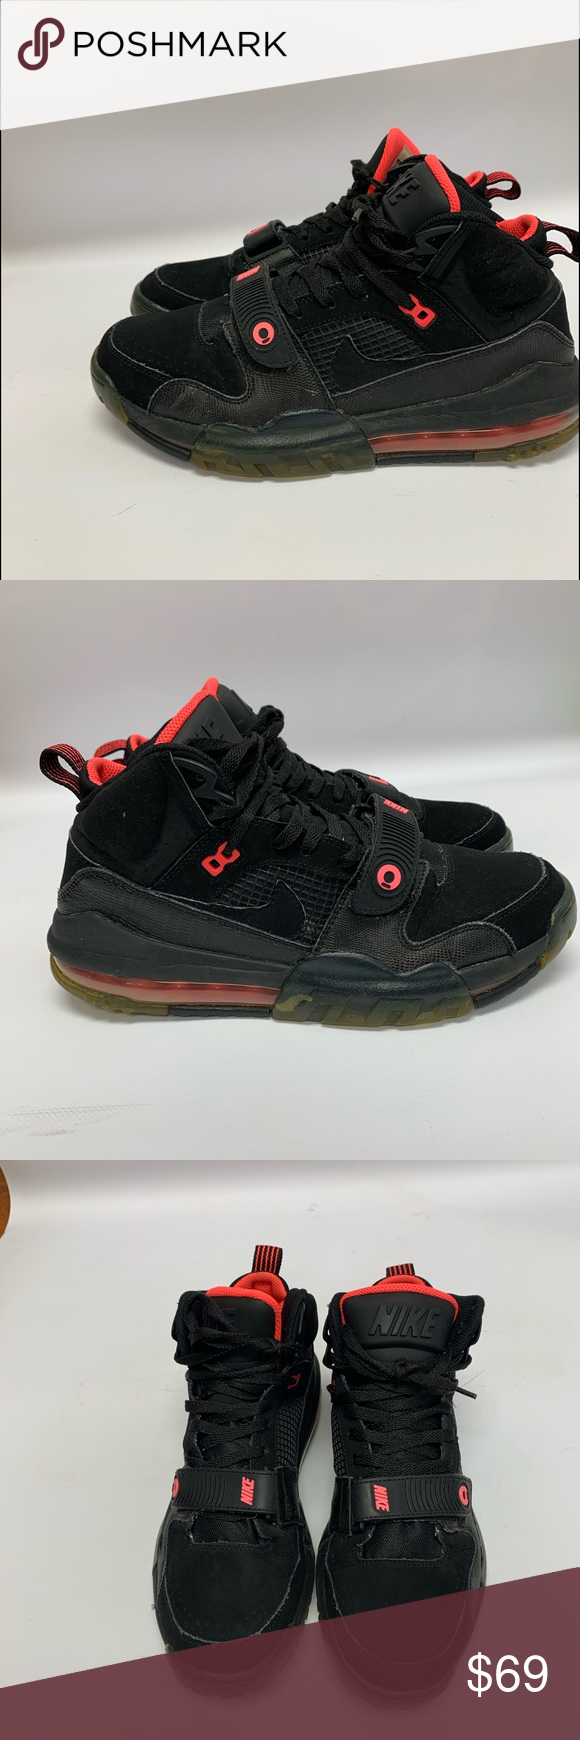 Air Max BO Jackson Men's Shoes Air Max BO Jax Men's Shoes Black/Black-Hyper Punc…